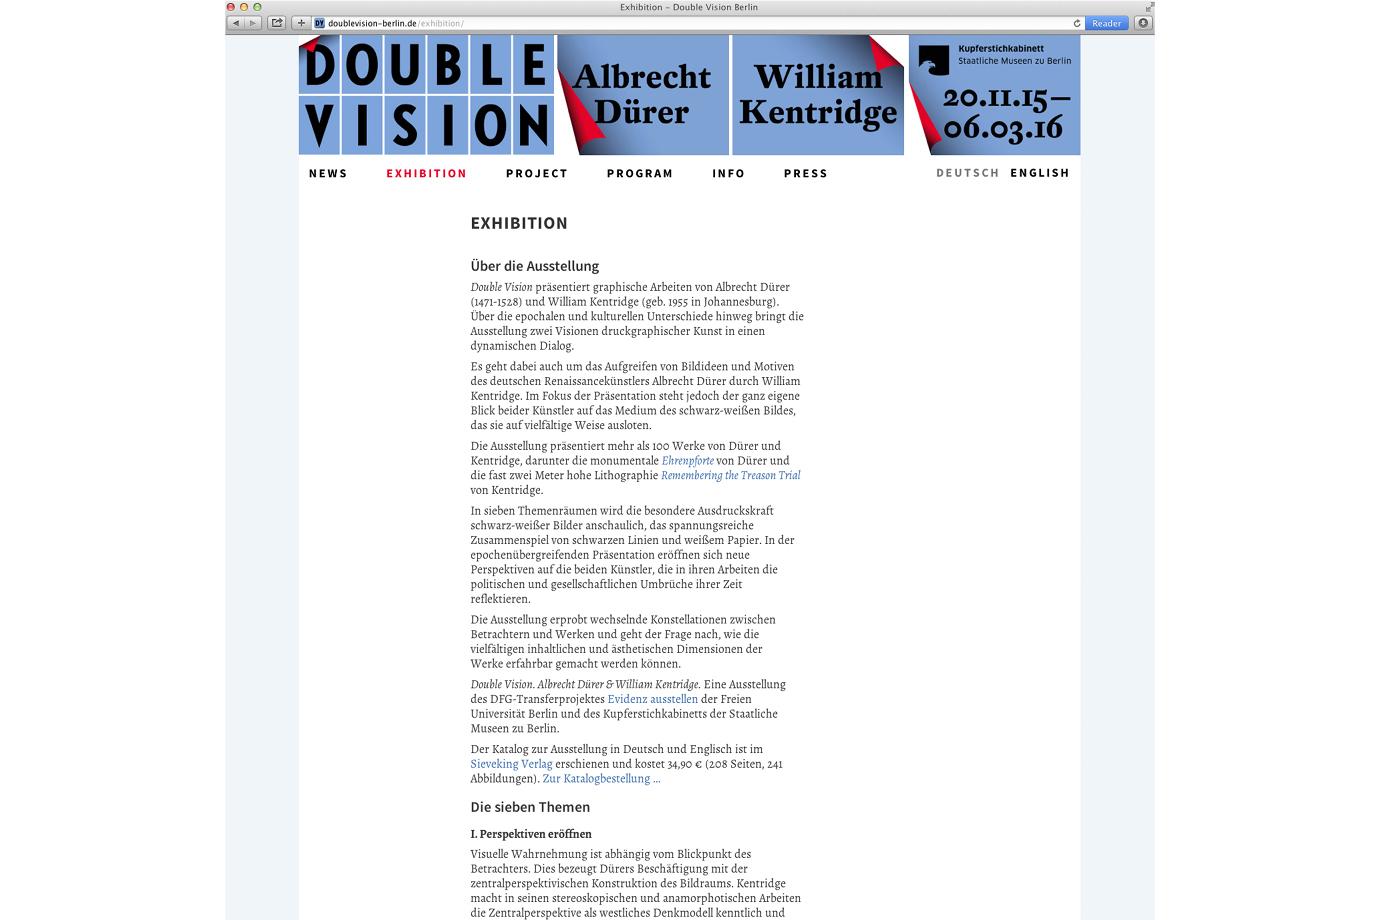 http://e-o-t.de/wordpress/wp-content/uploads/2017/11/2014_eot-DoubleVision-Web-04.jpg